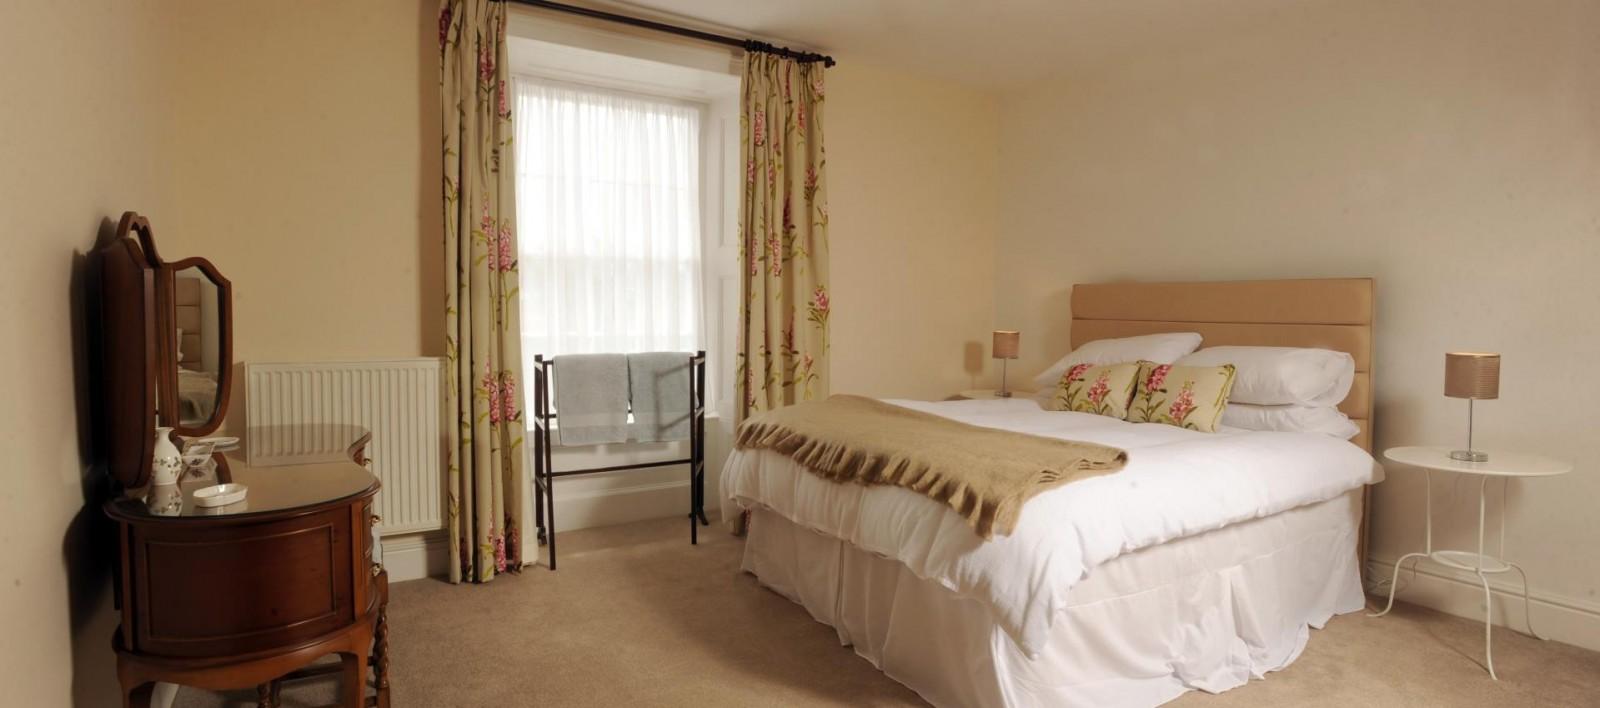 4 bedroom house St Davids